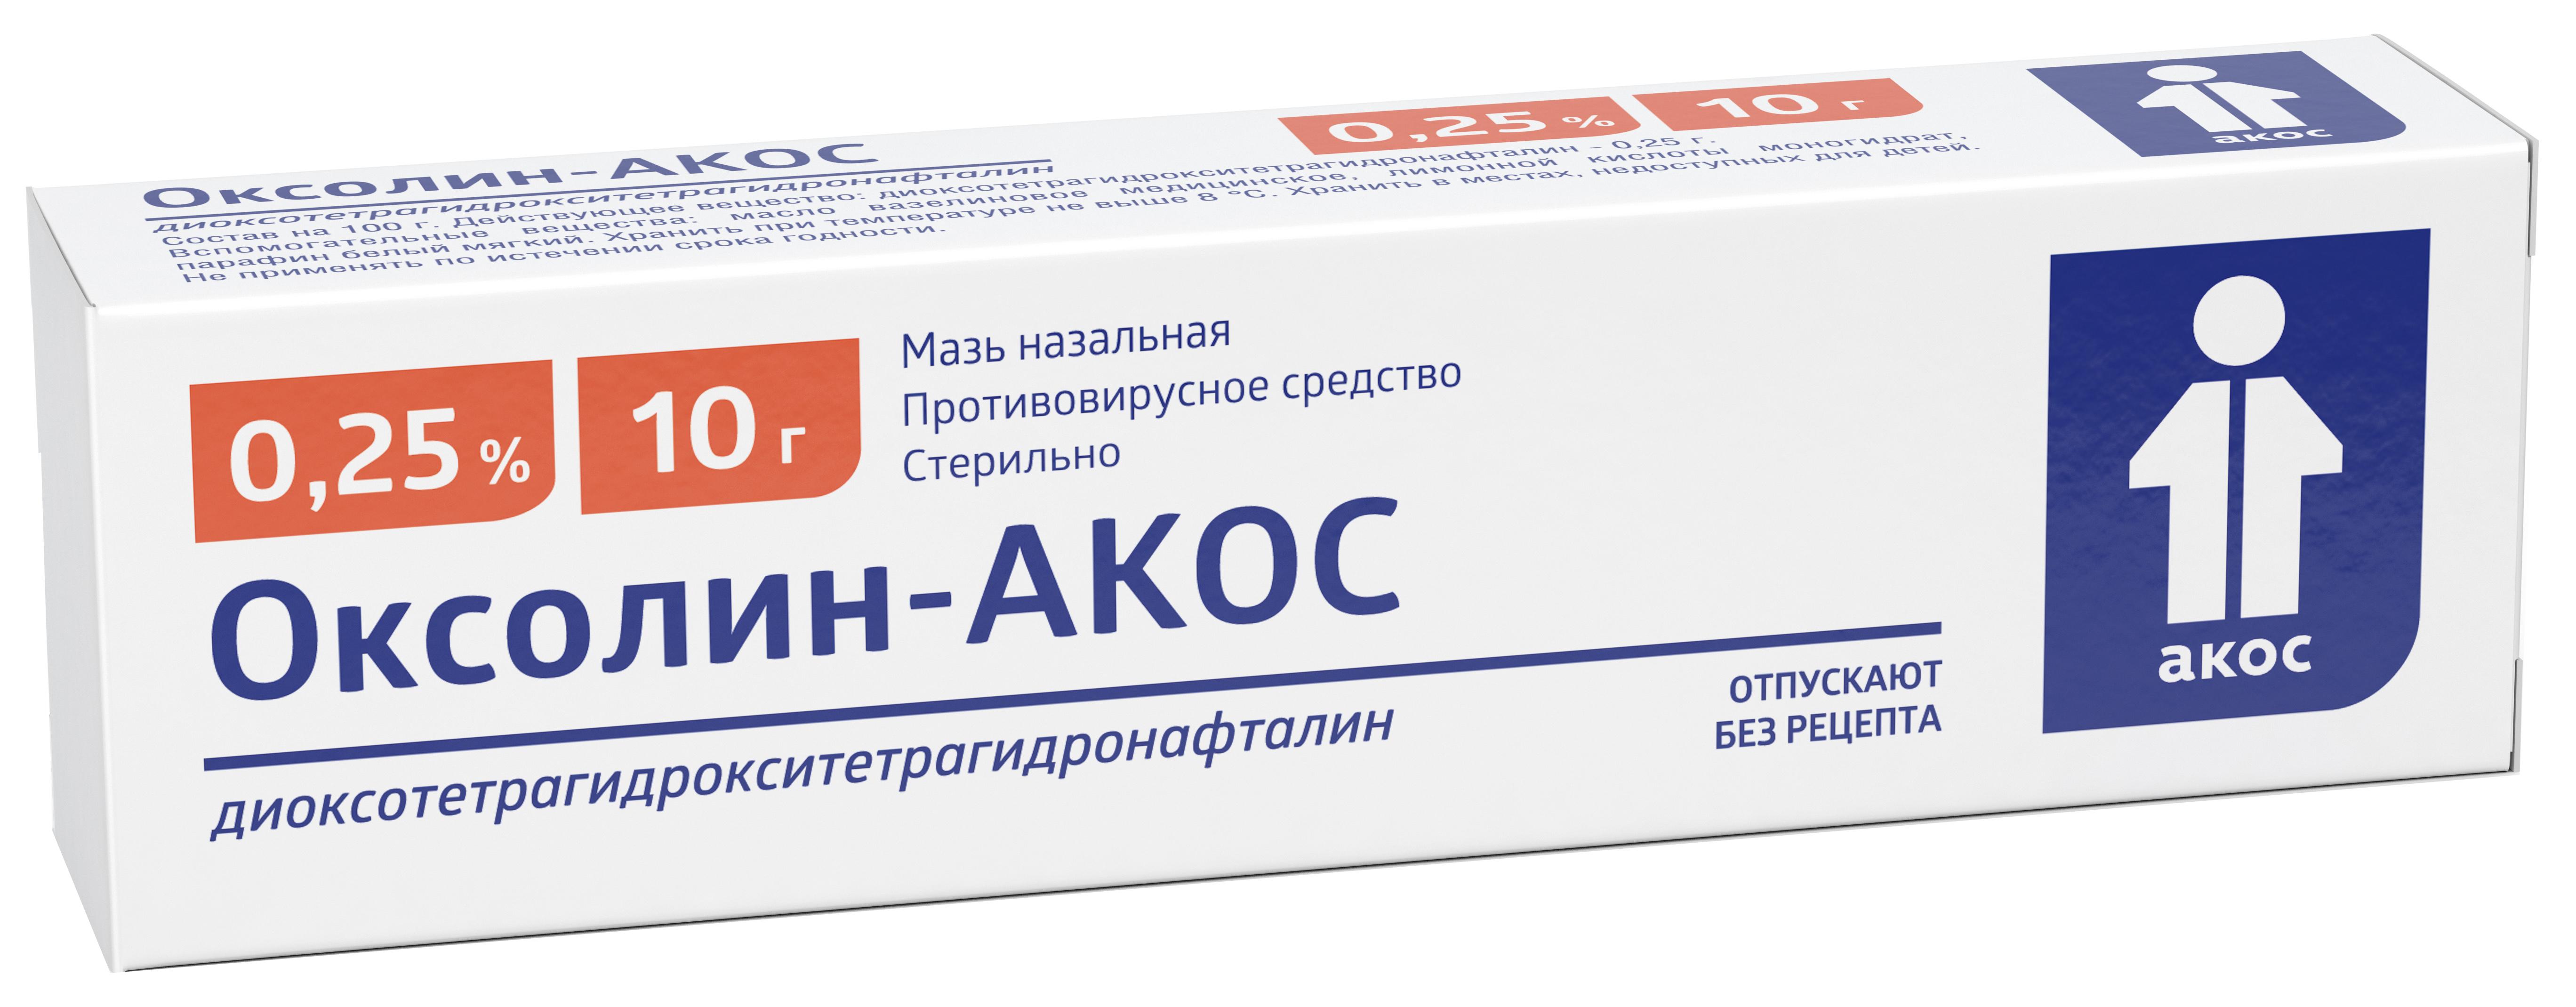 ОКСОЛИН-АКОС 0,25% 10г мазь назальная